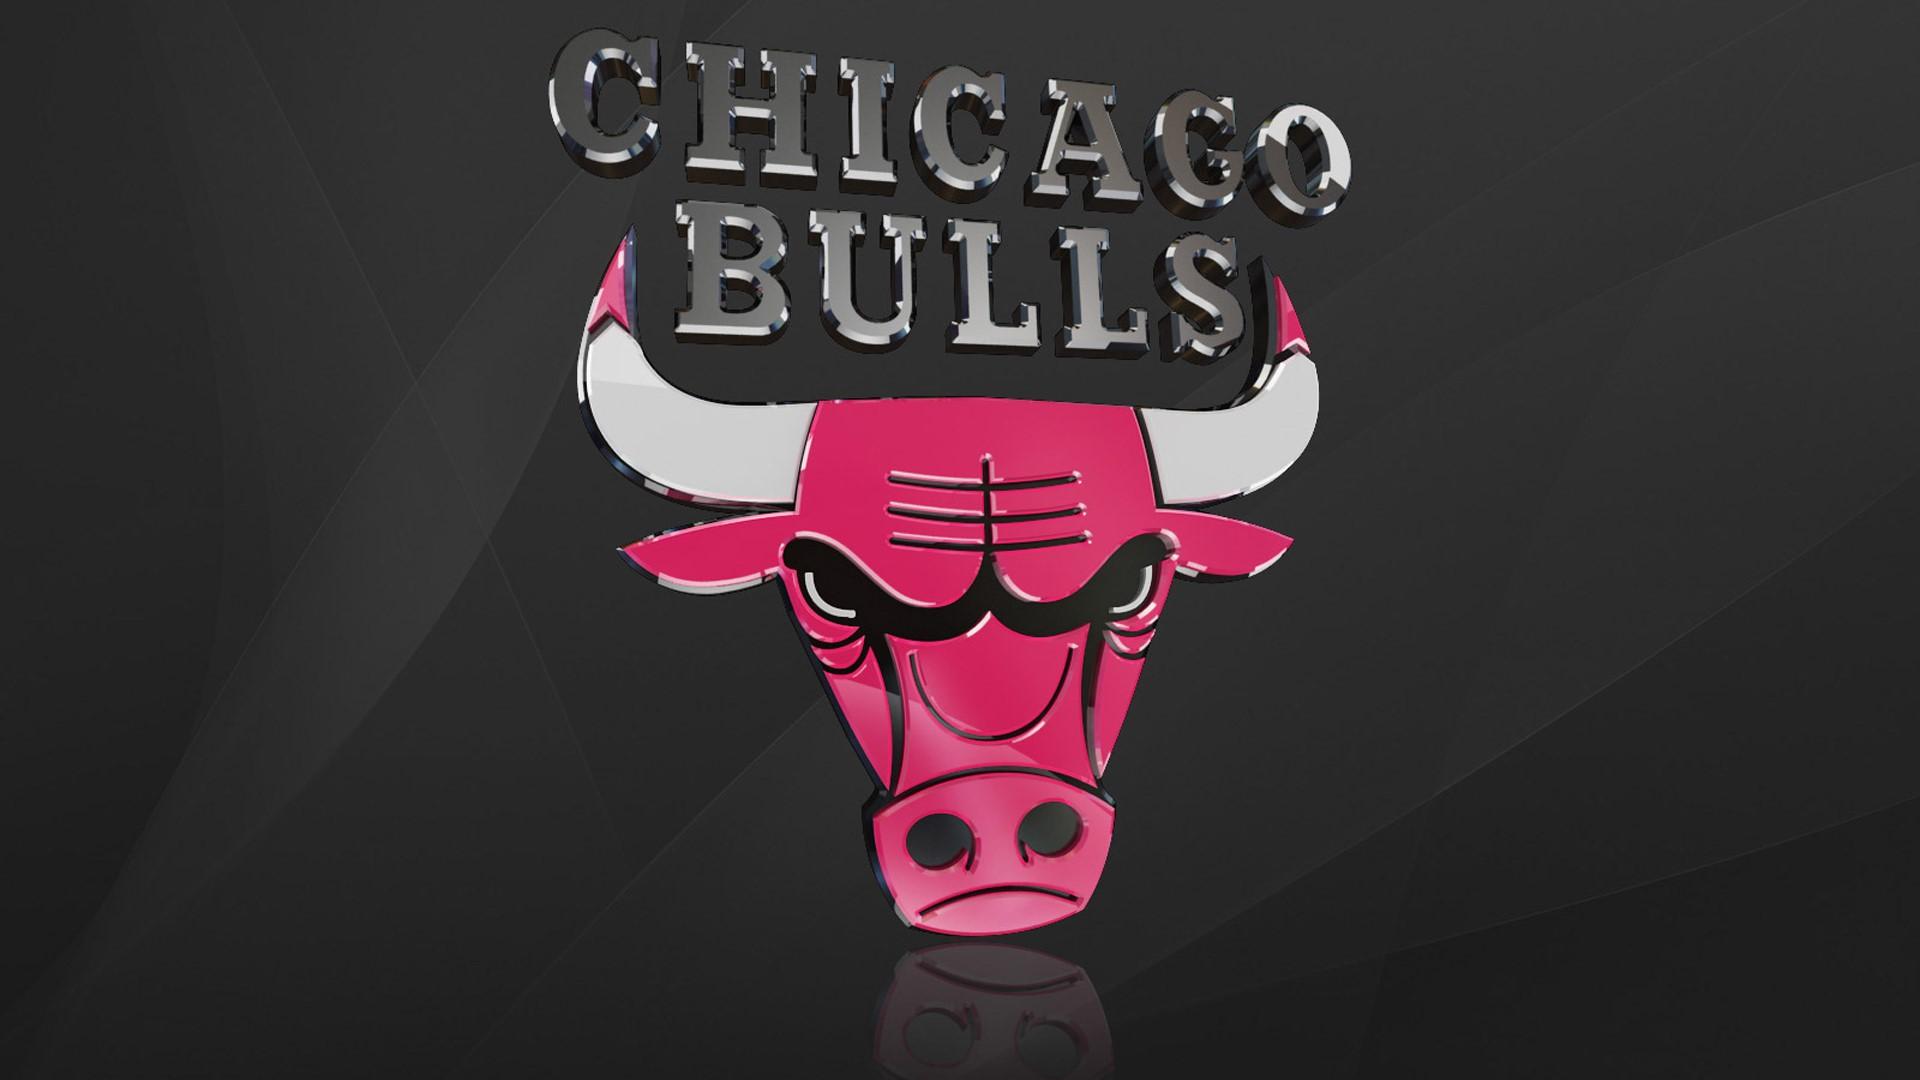 Chicago Bulls Photos